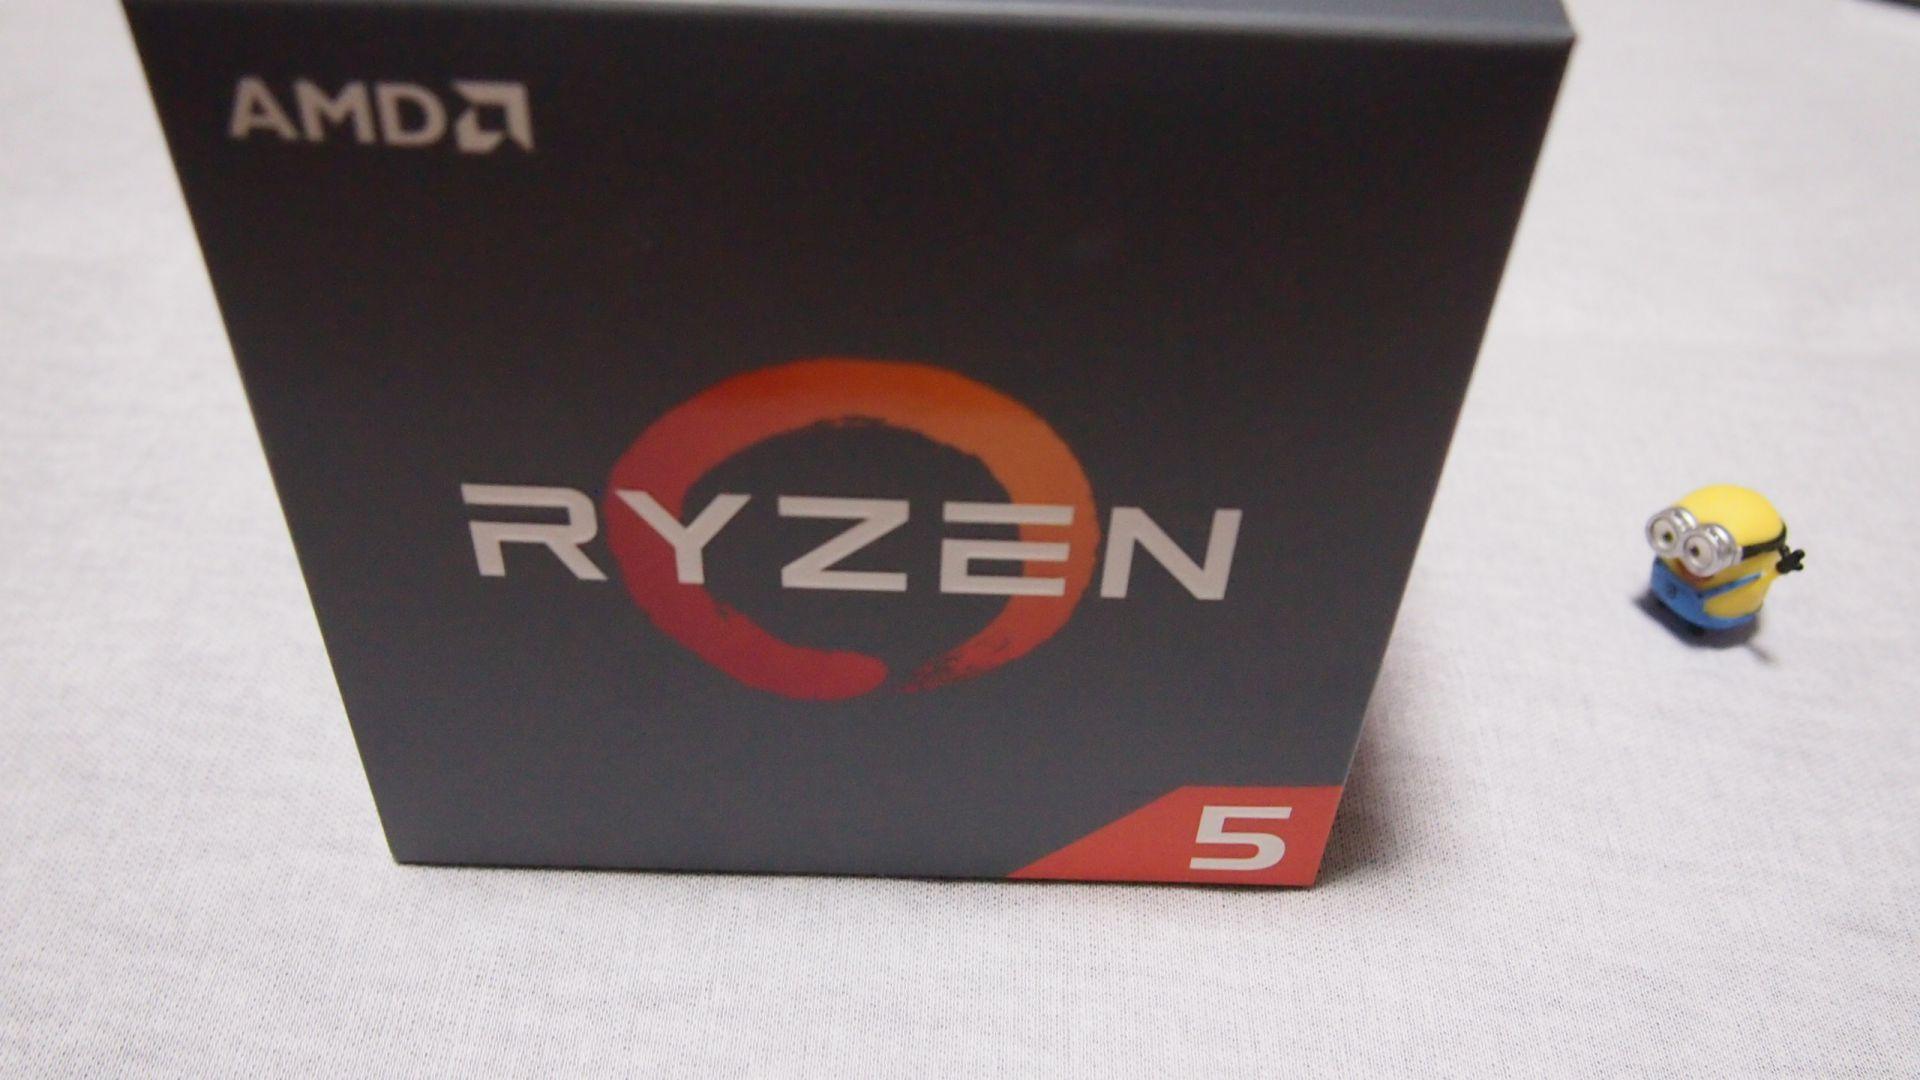 Ryzen5 1600